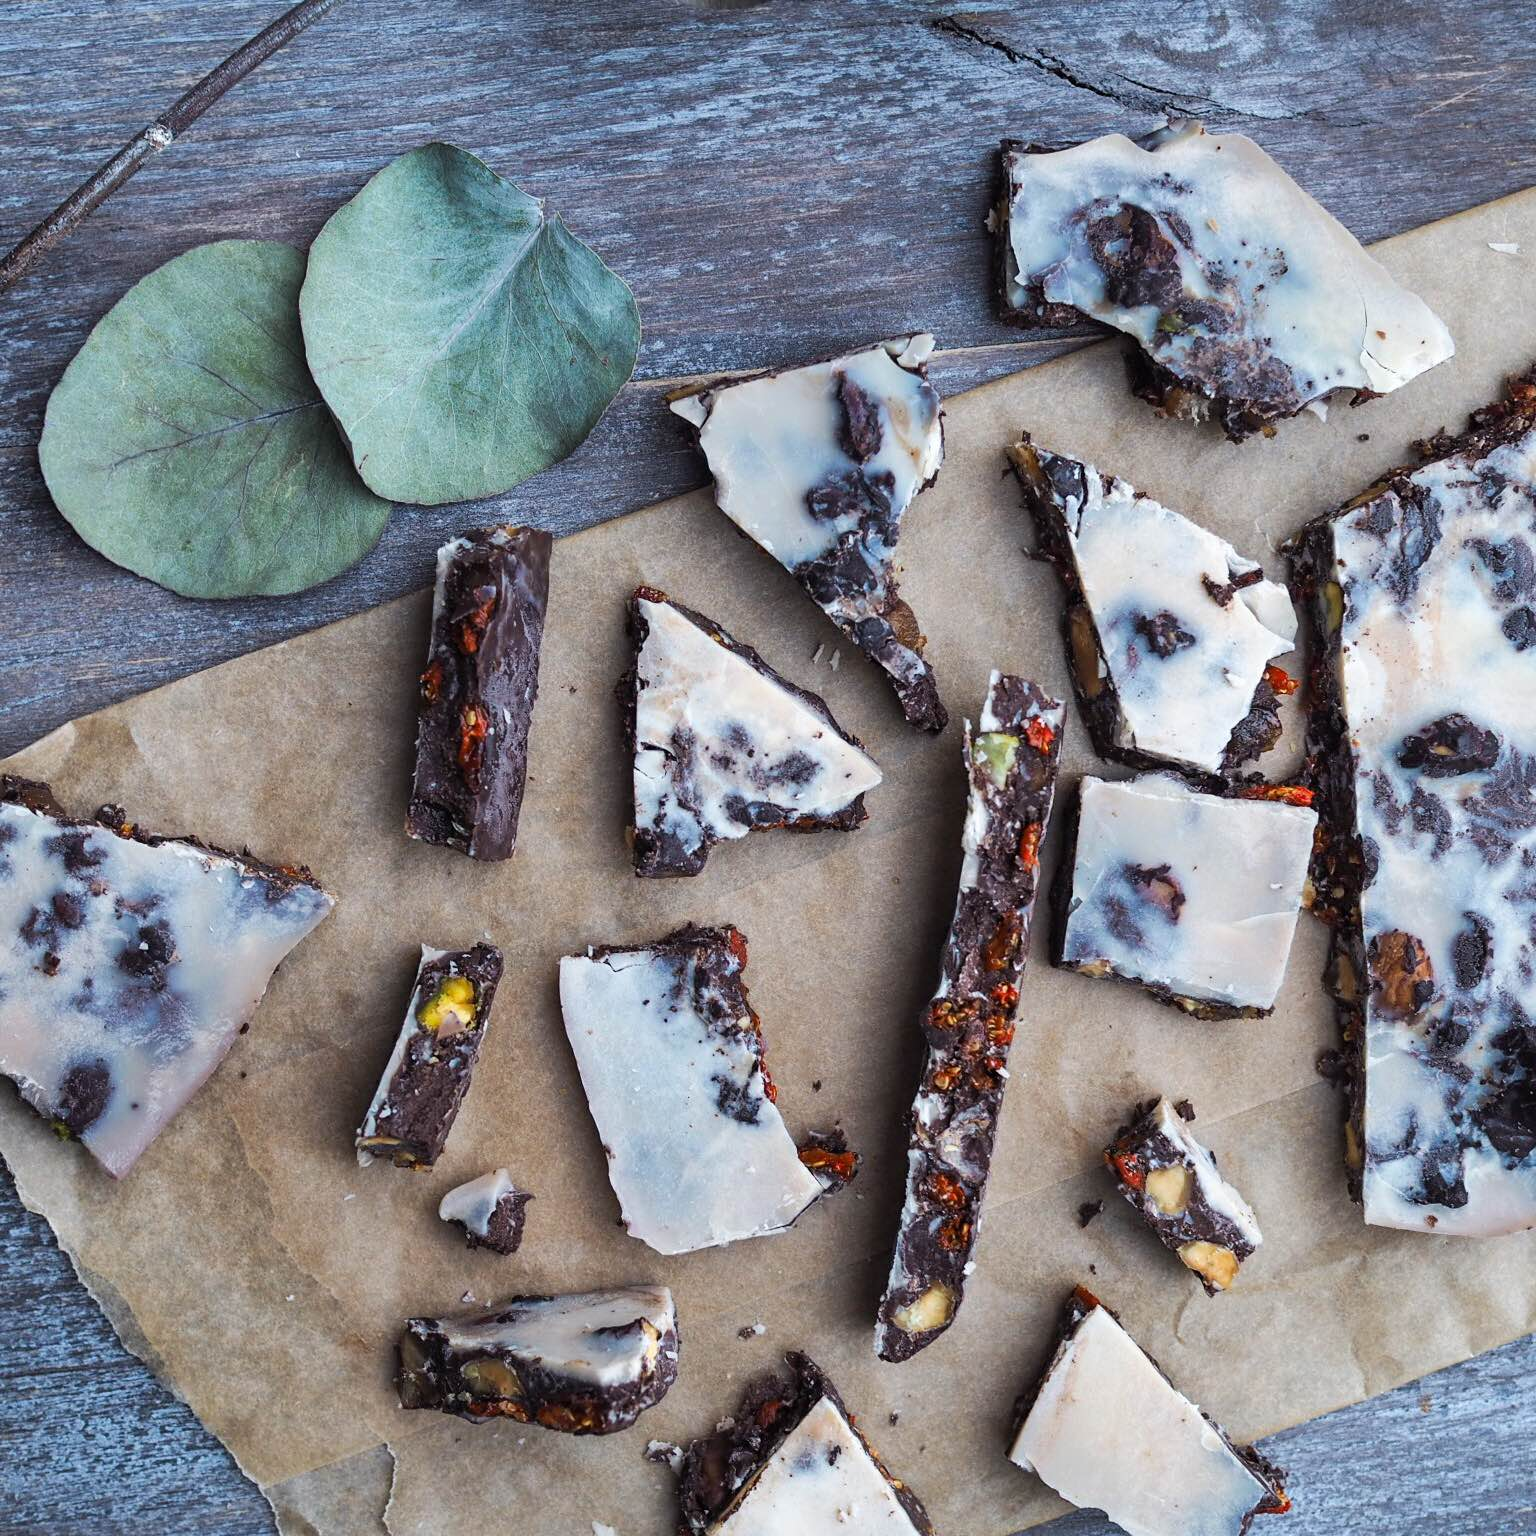 Sund chokoladebrud med fyld; gojibær, nødder og dadler. Lavet på kokosmælk og uden sukker. (Kakaosmør)